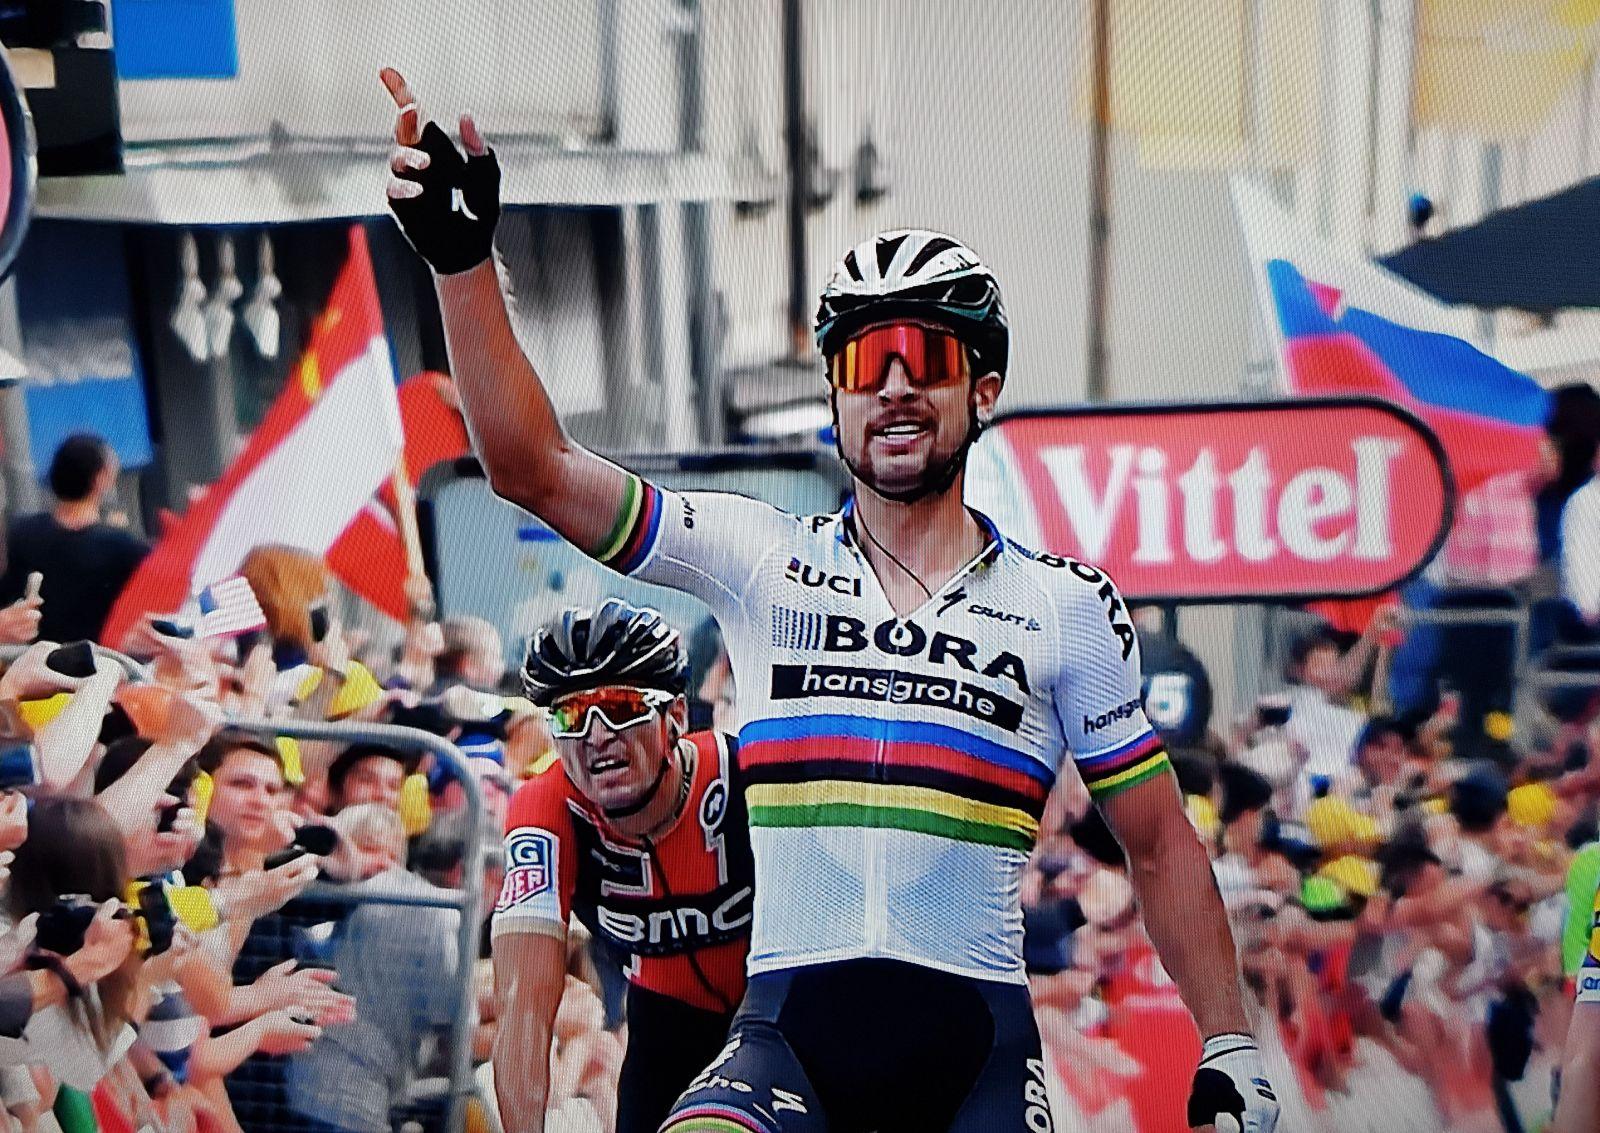 6e4aa019dd850 Video: Skvelý Peter Sagan vyhral tretiu etapu na Tour de France  (aktualizované)